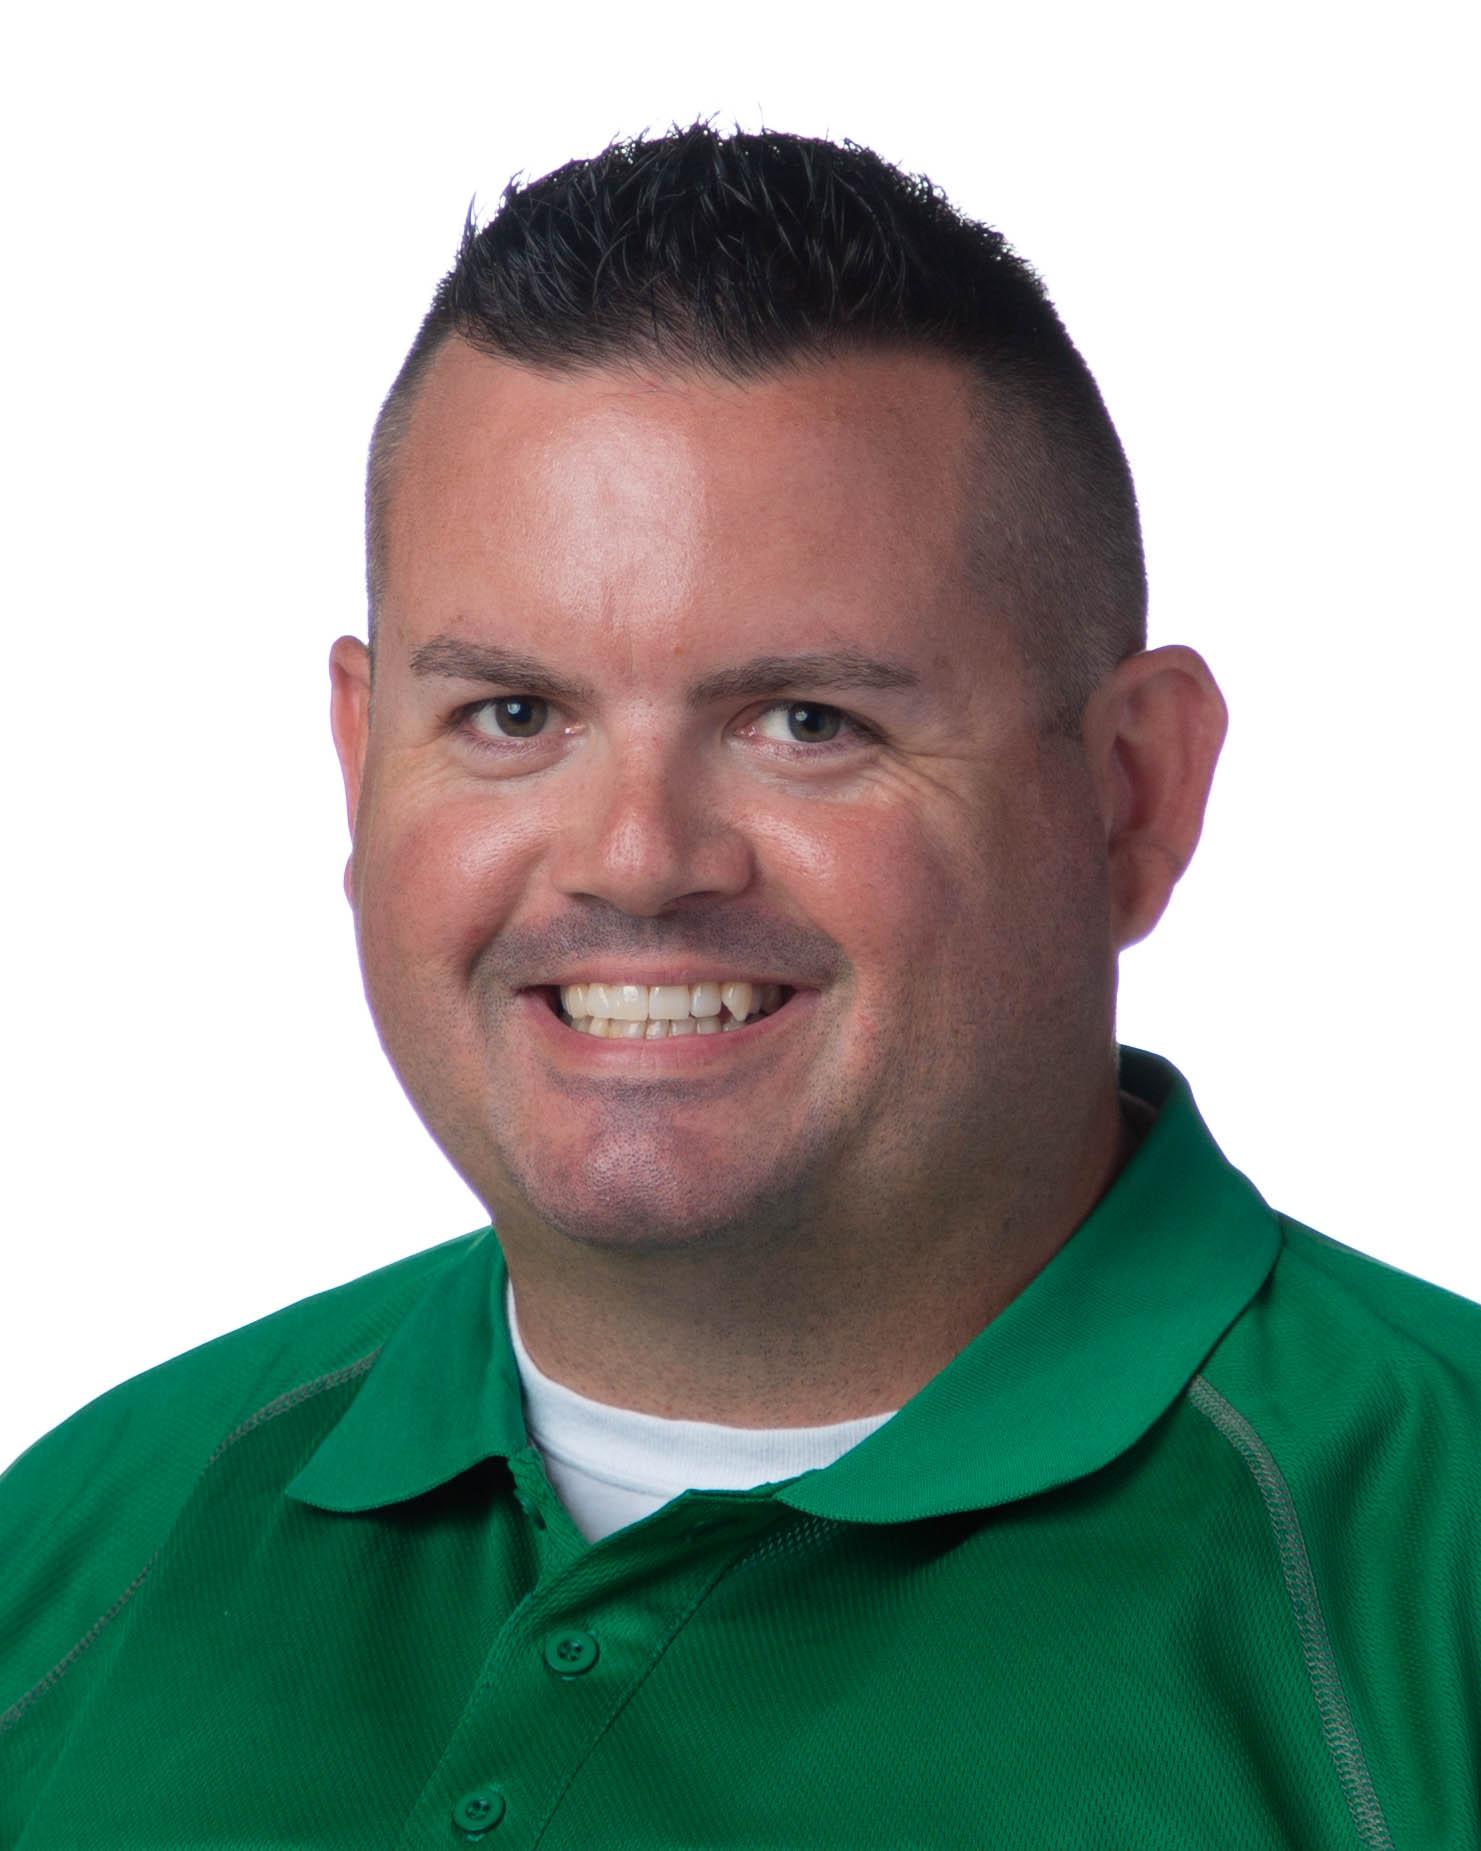 School Resource Officer, Sean Waddle